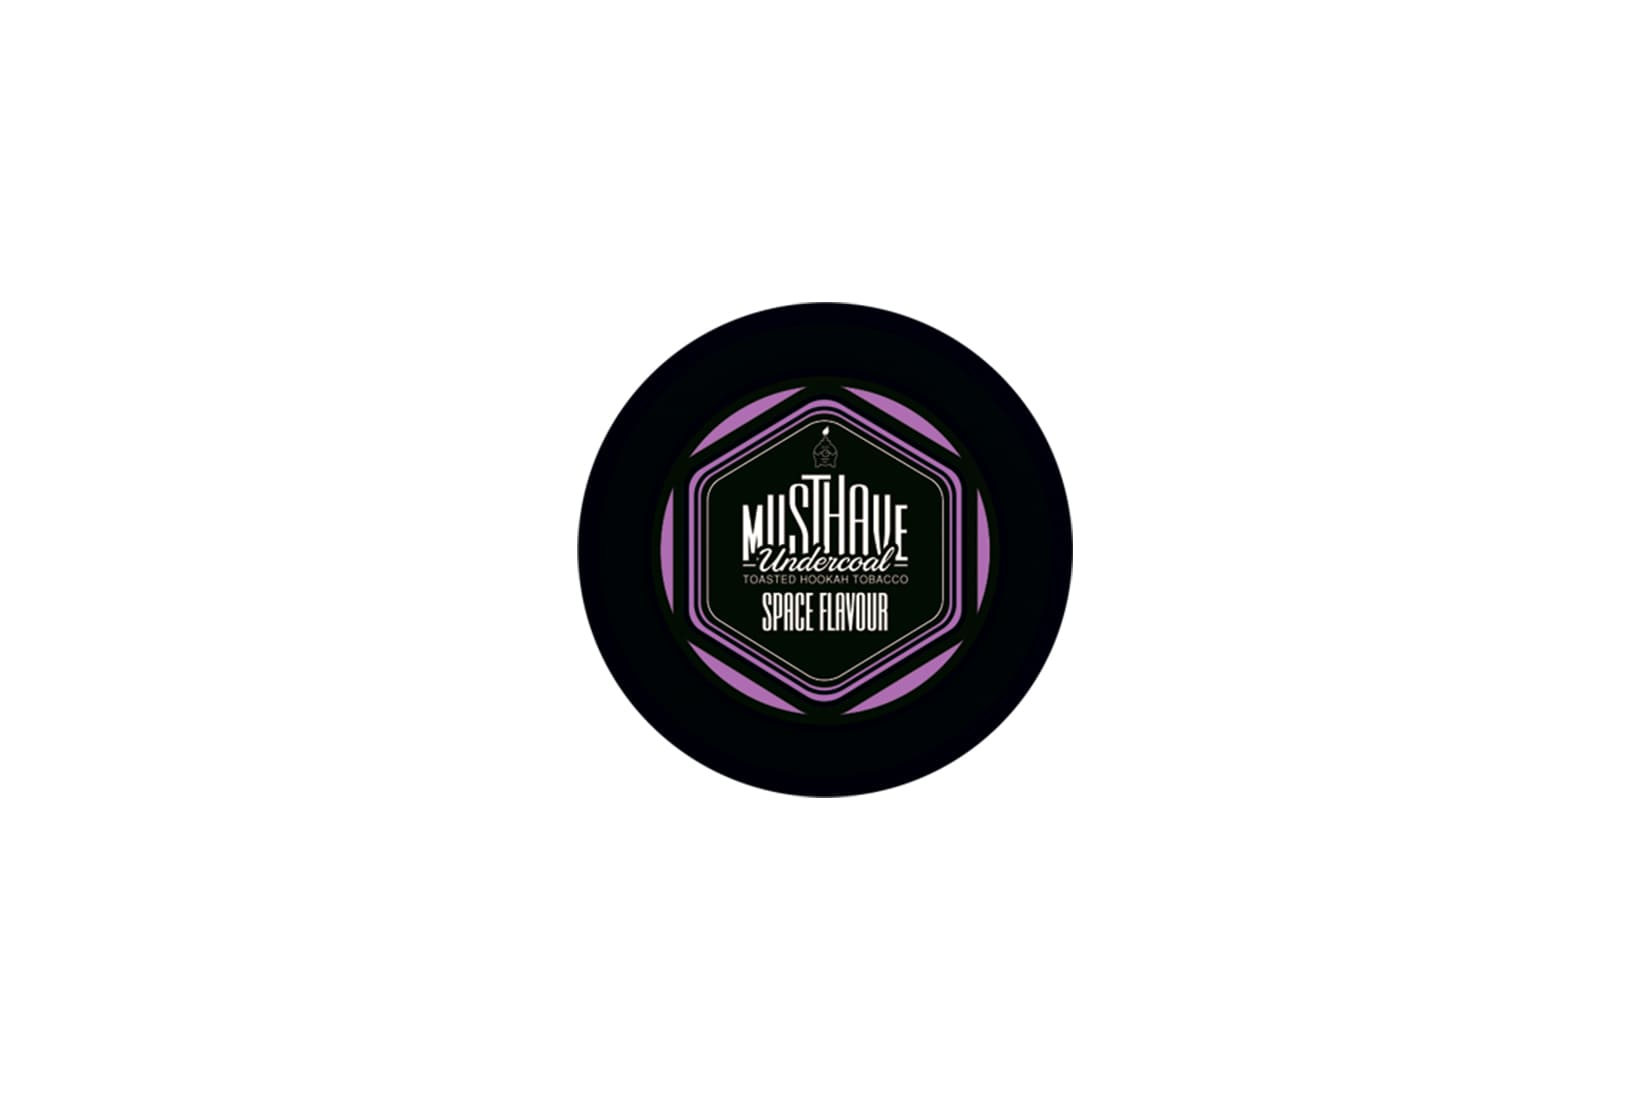 Табак для кальяна MustHave Space Flavour – описание, миксы, отзывы